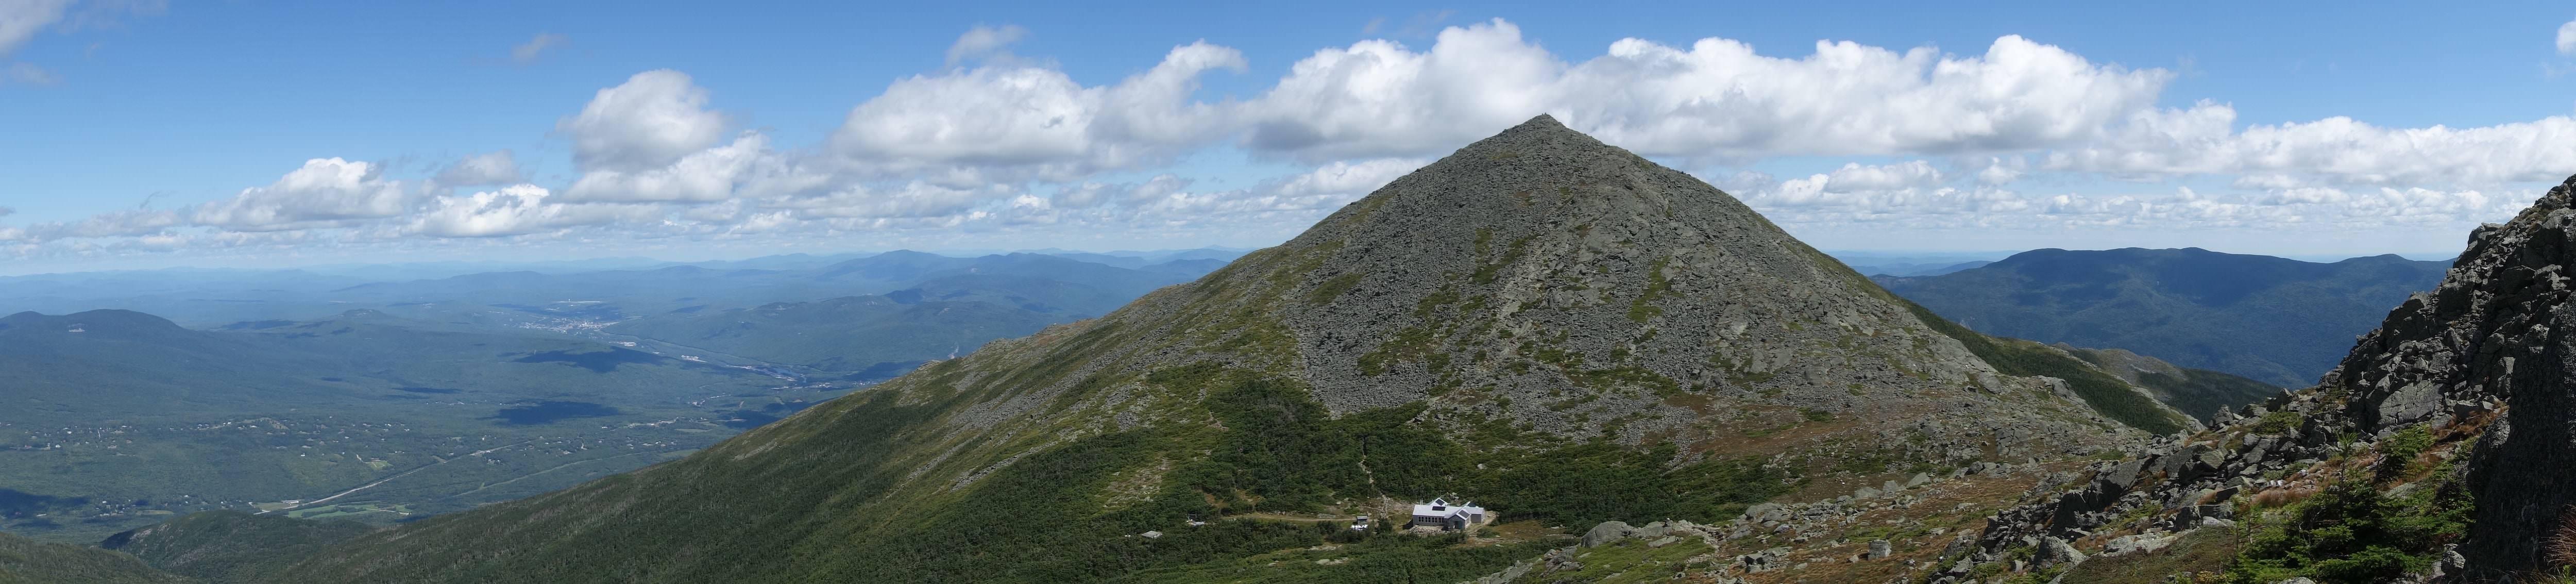 Mount Madison and Madison Spring Hut, White Mountains